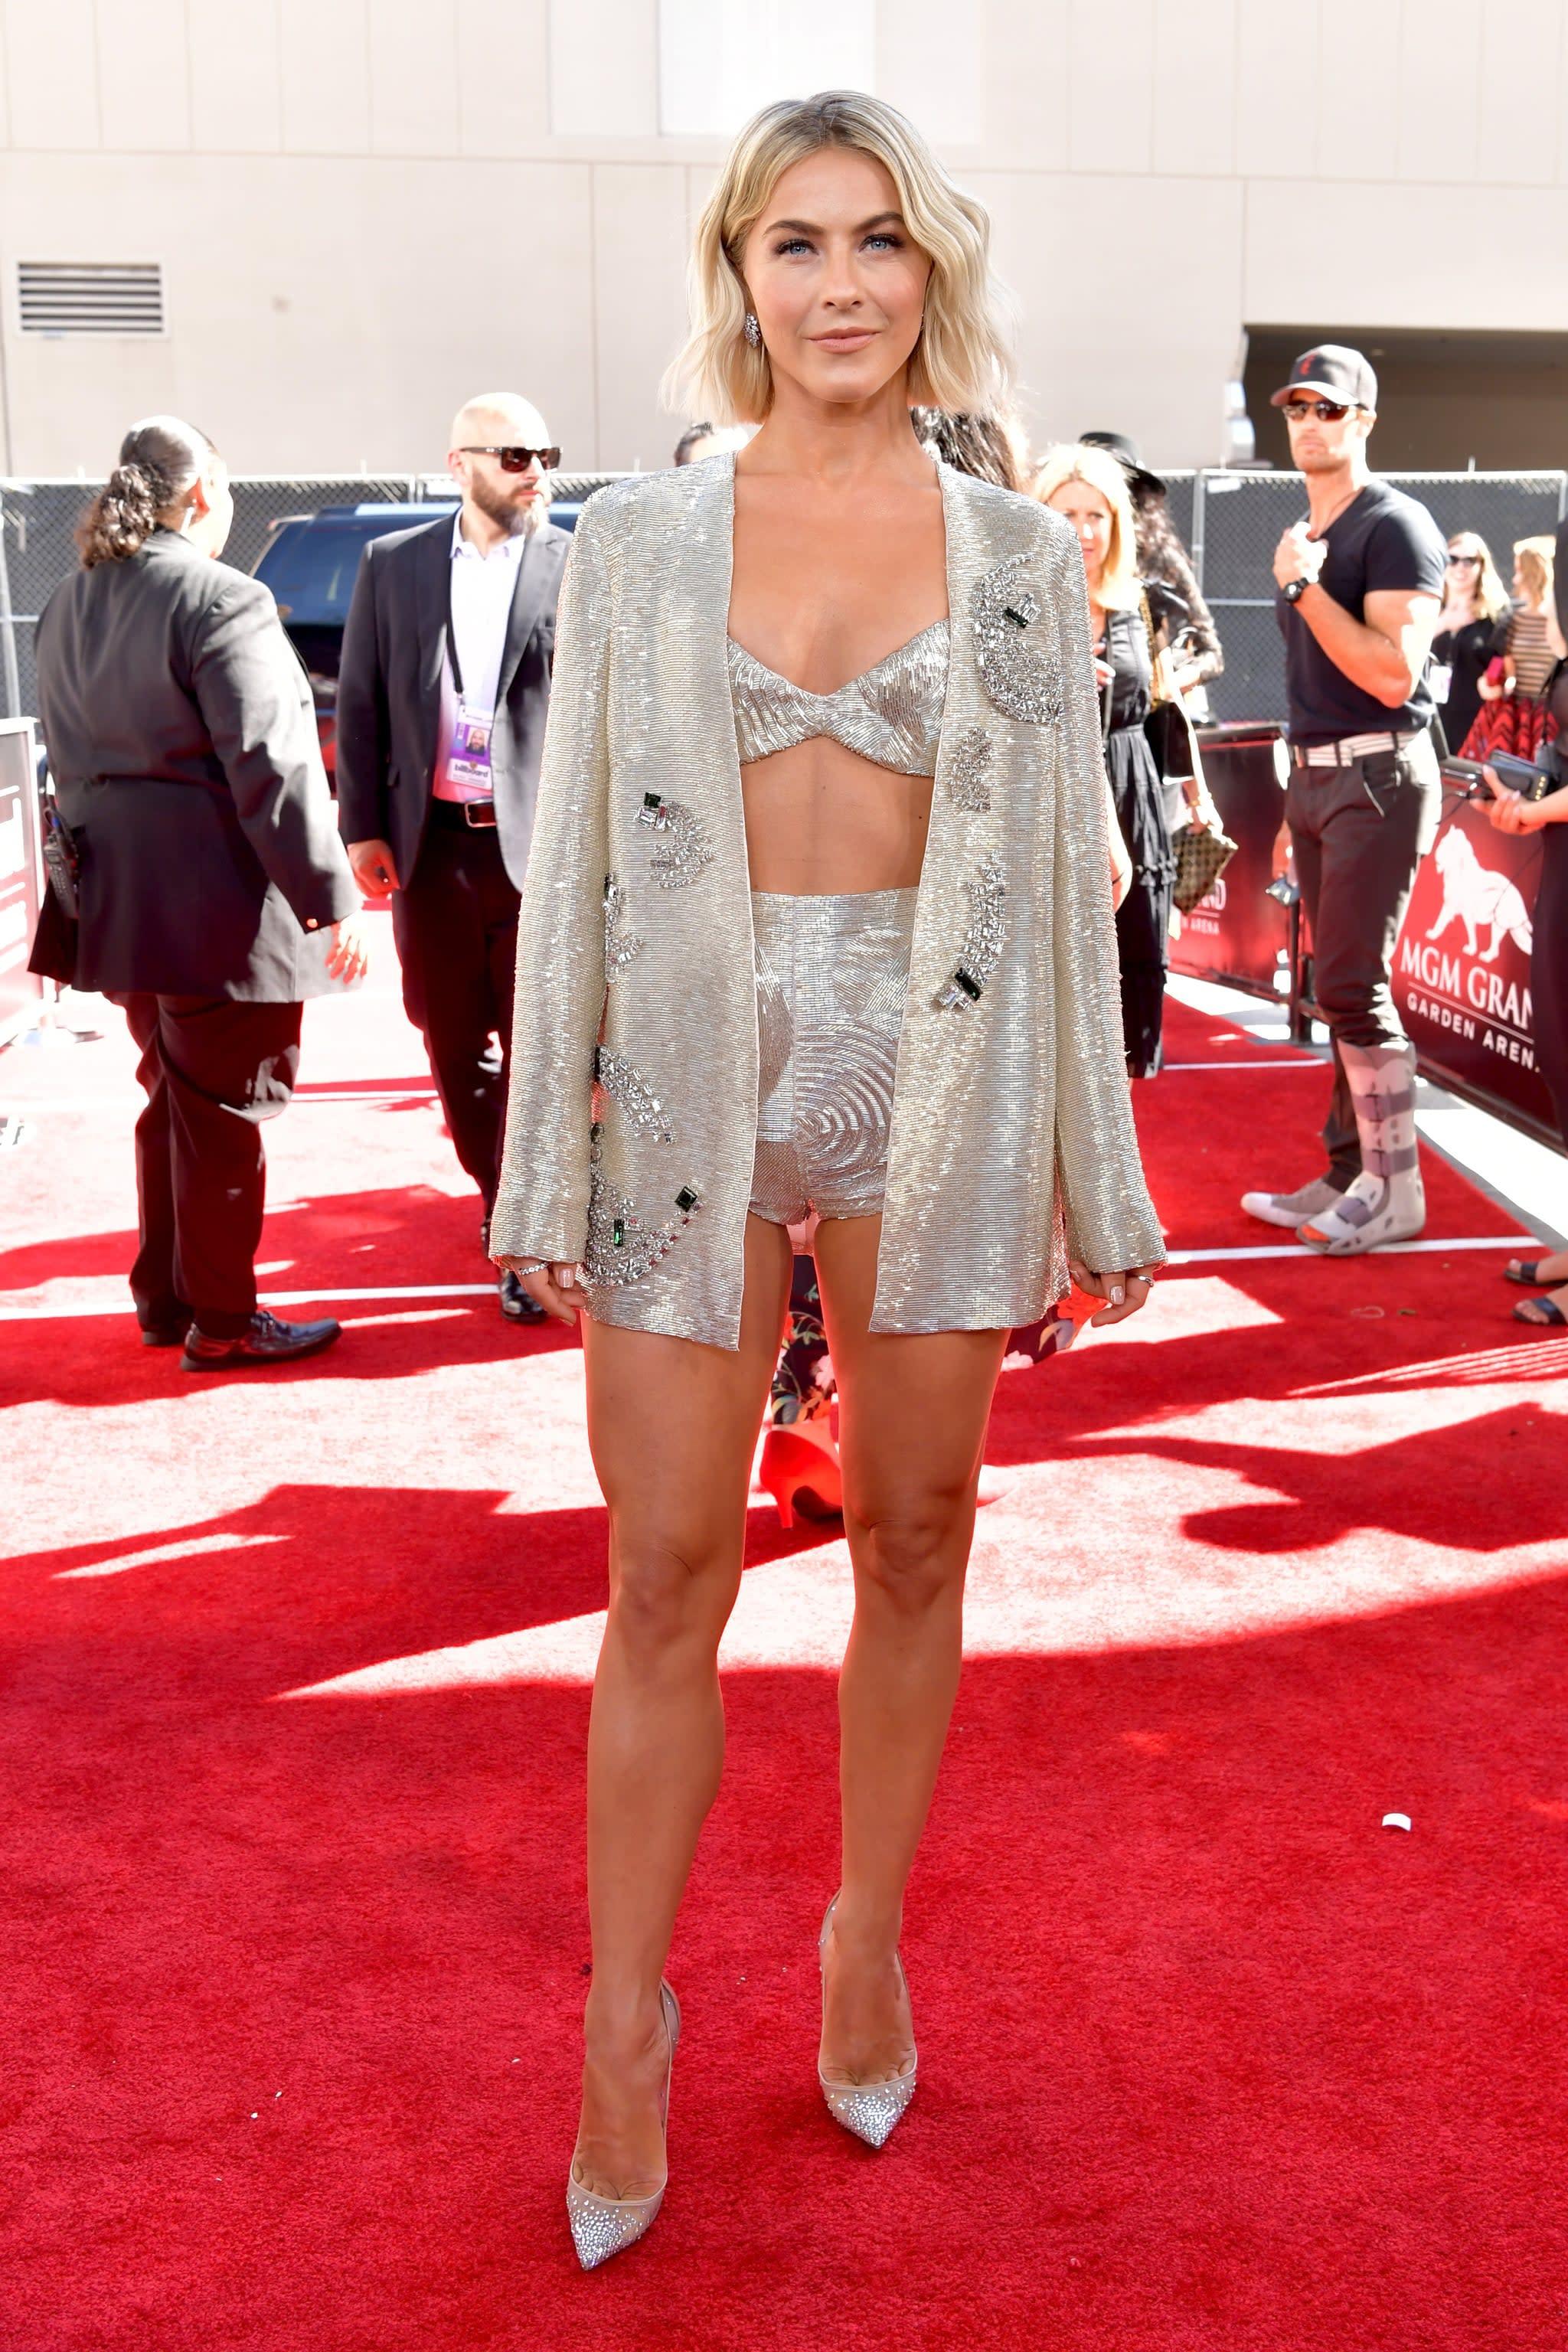 64615003 It Must Be Bikini Season - Julianne Hough Just Wore Hers on the Red Carpet